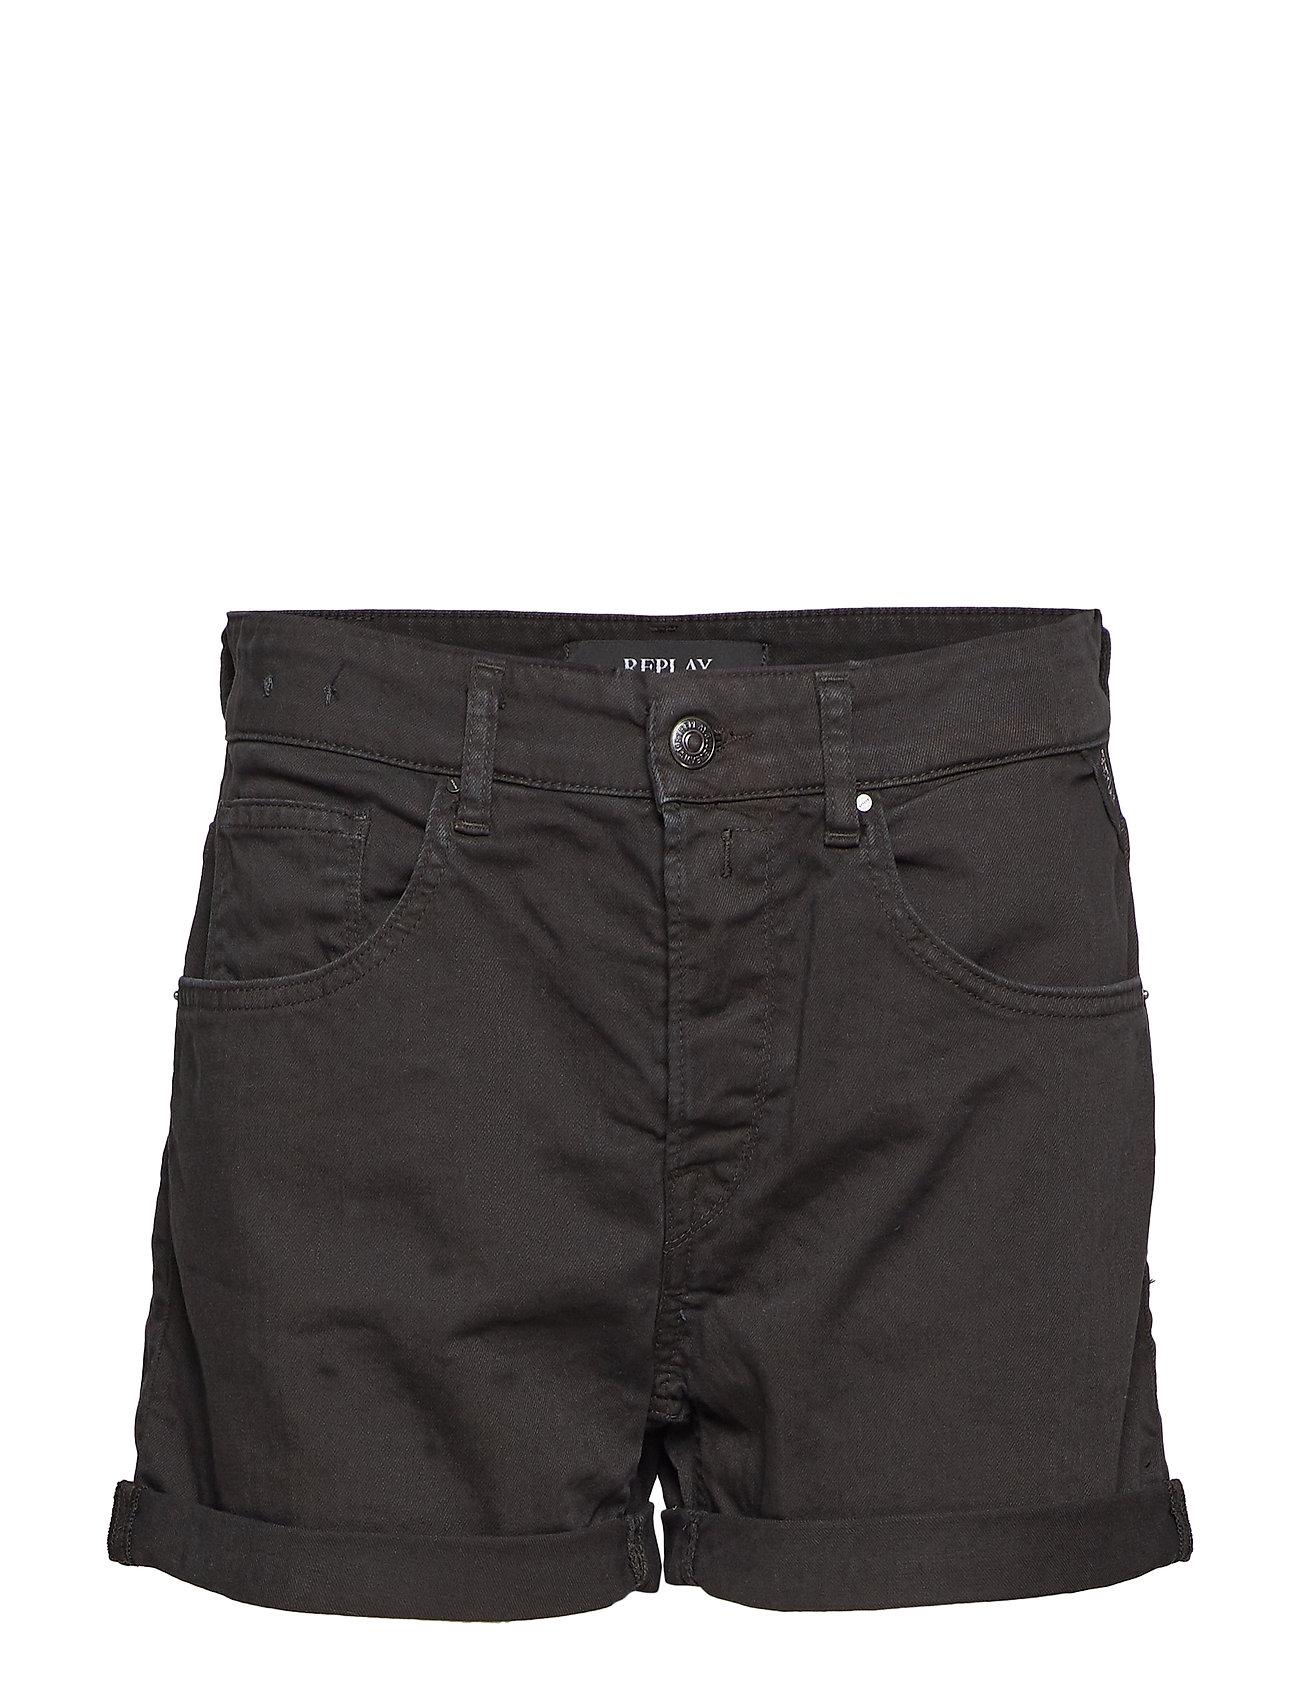 Replay Denim Shorts - BLACK